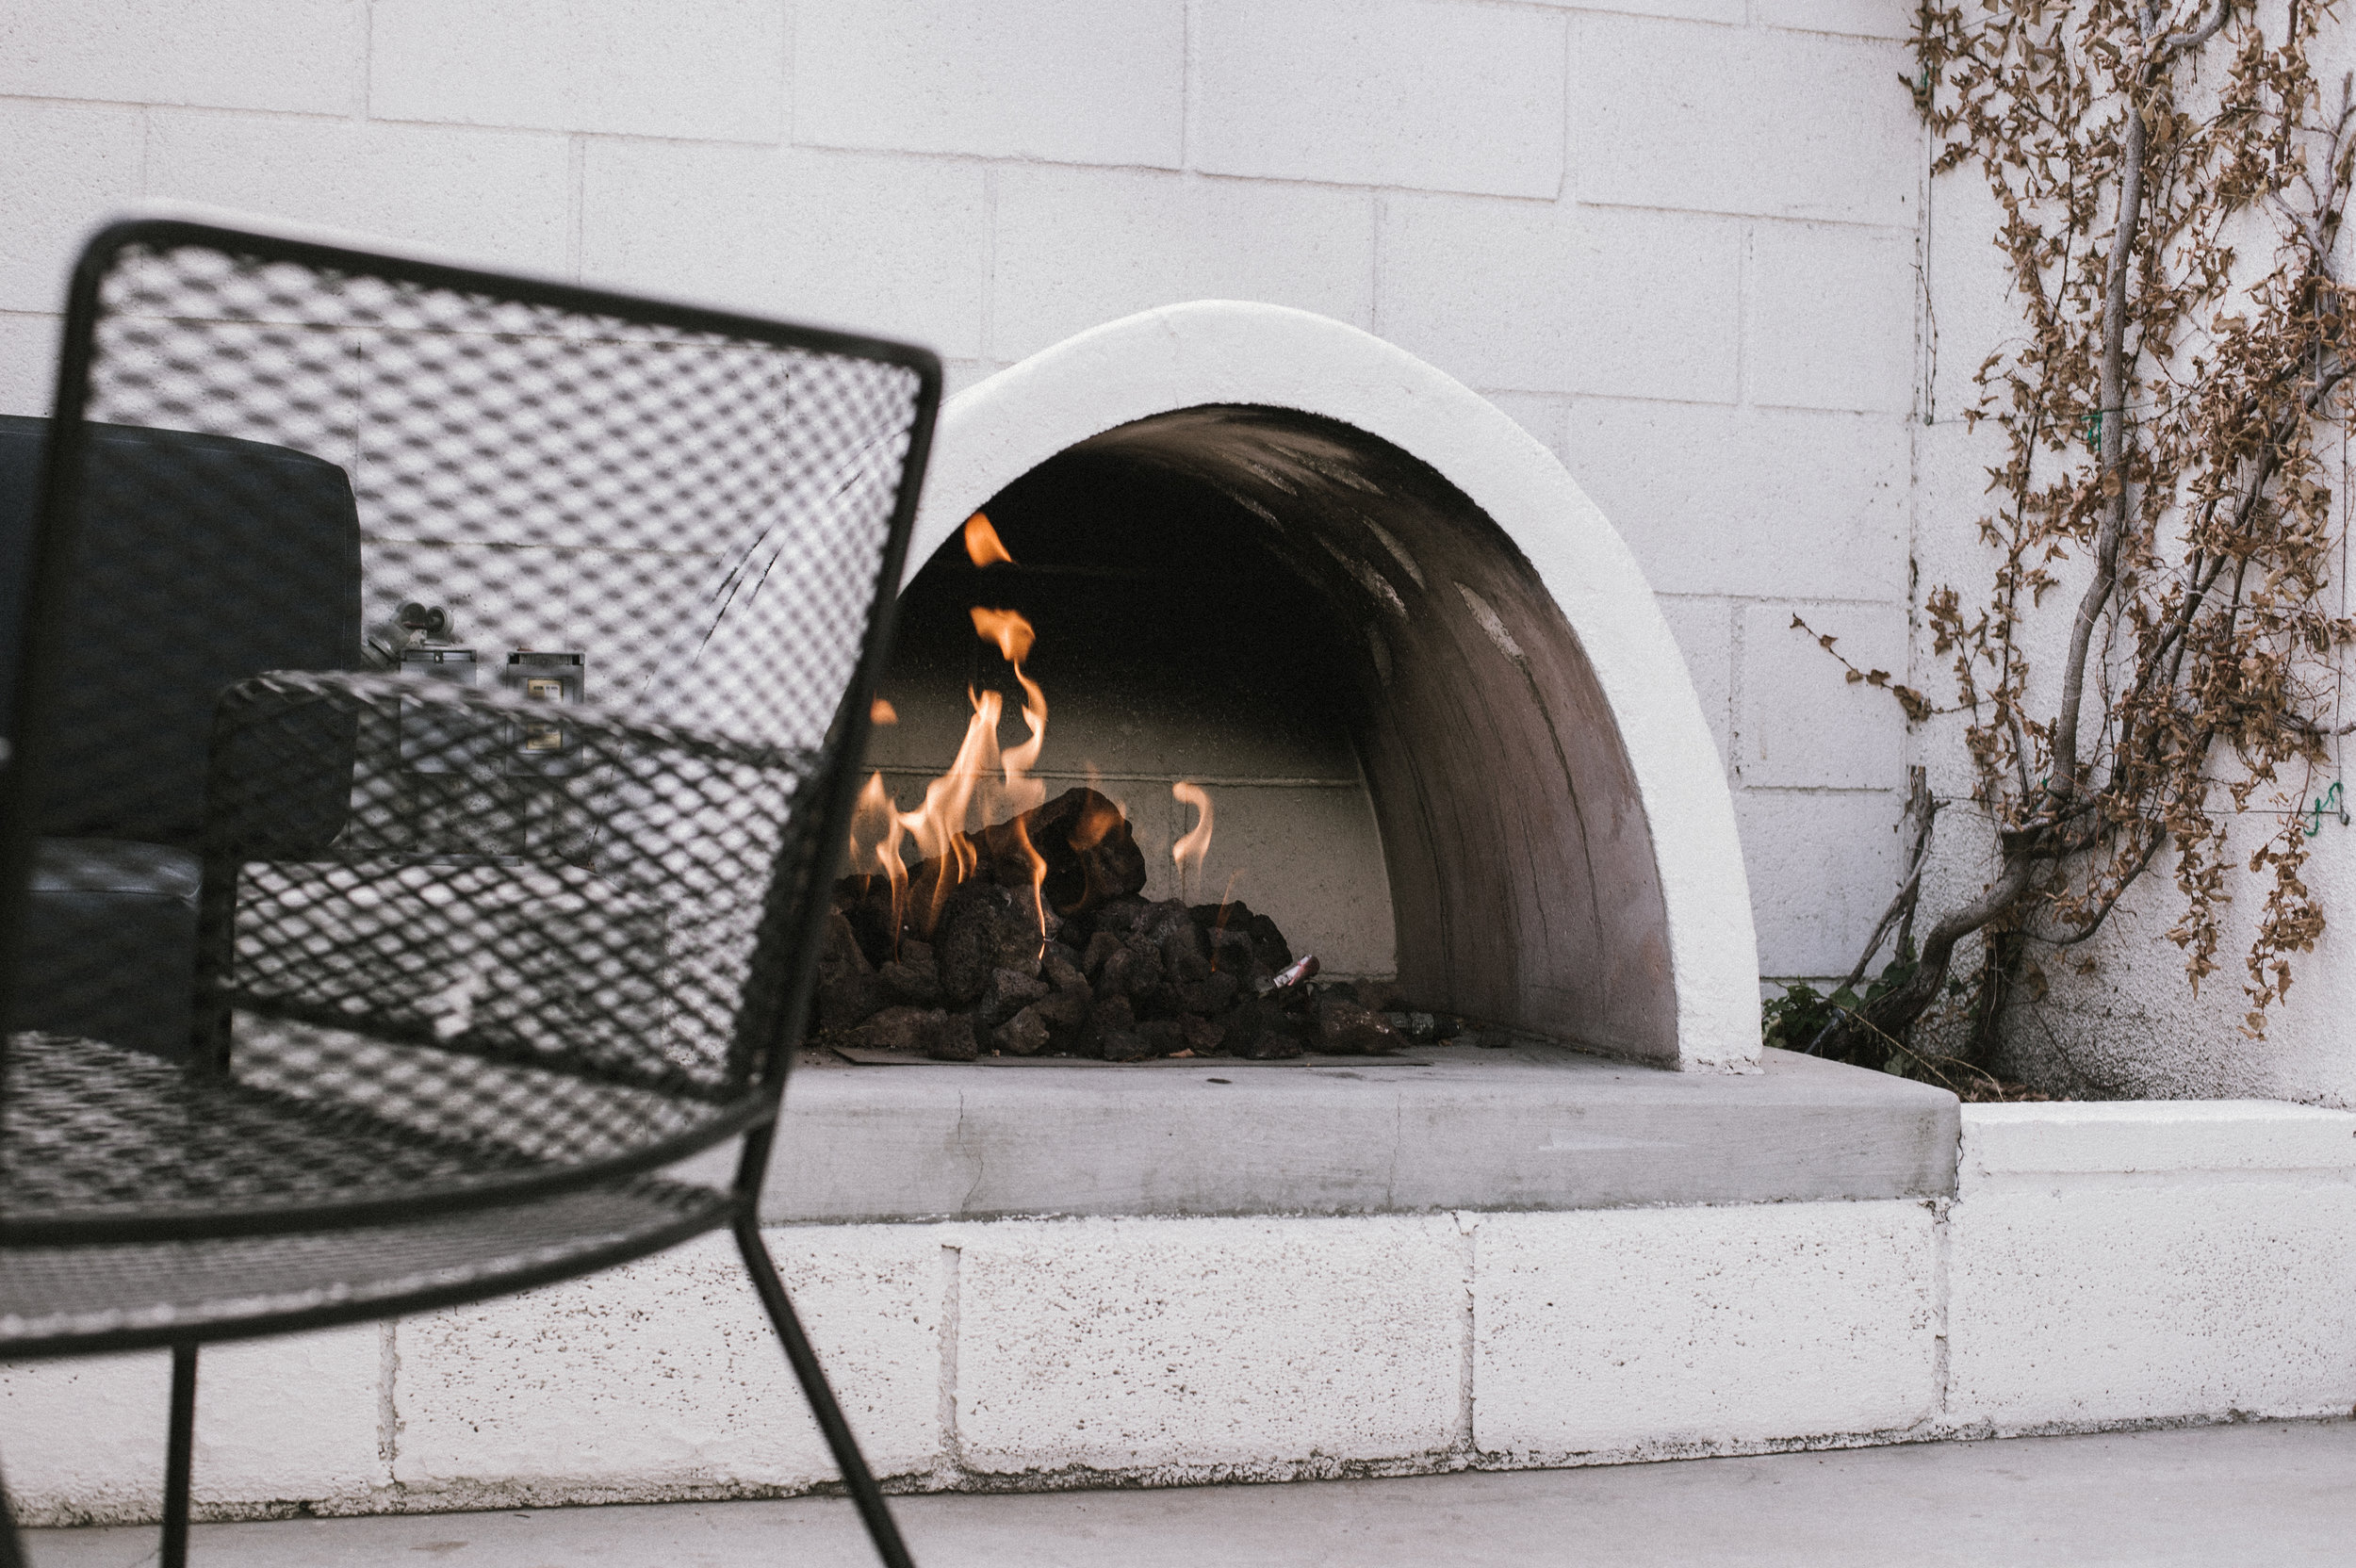 The-Glossier-Ace-Hotel-Palm-Springs-CA-28.jpg